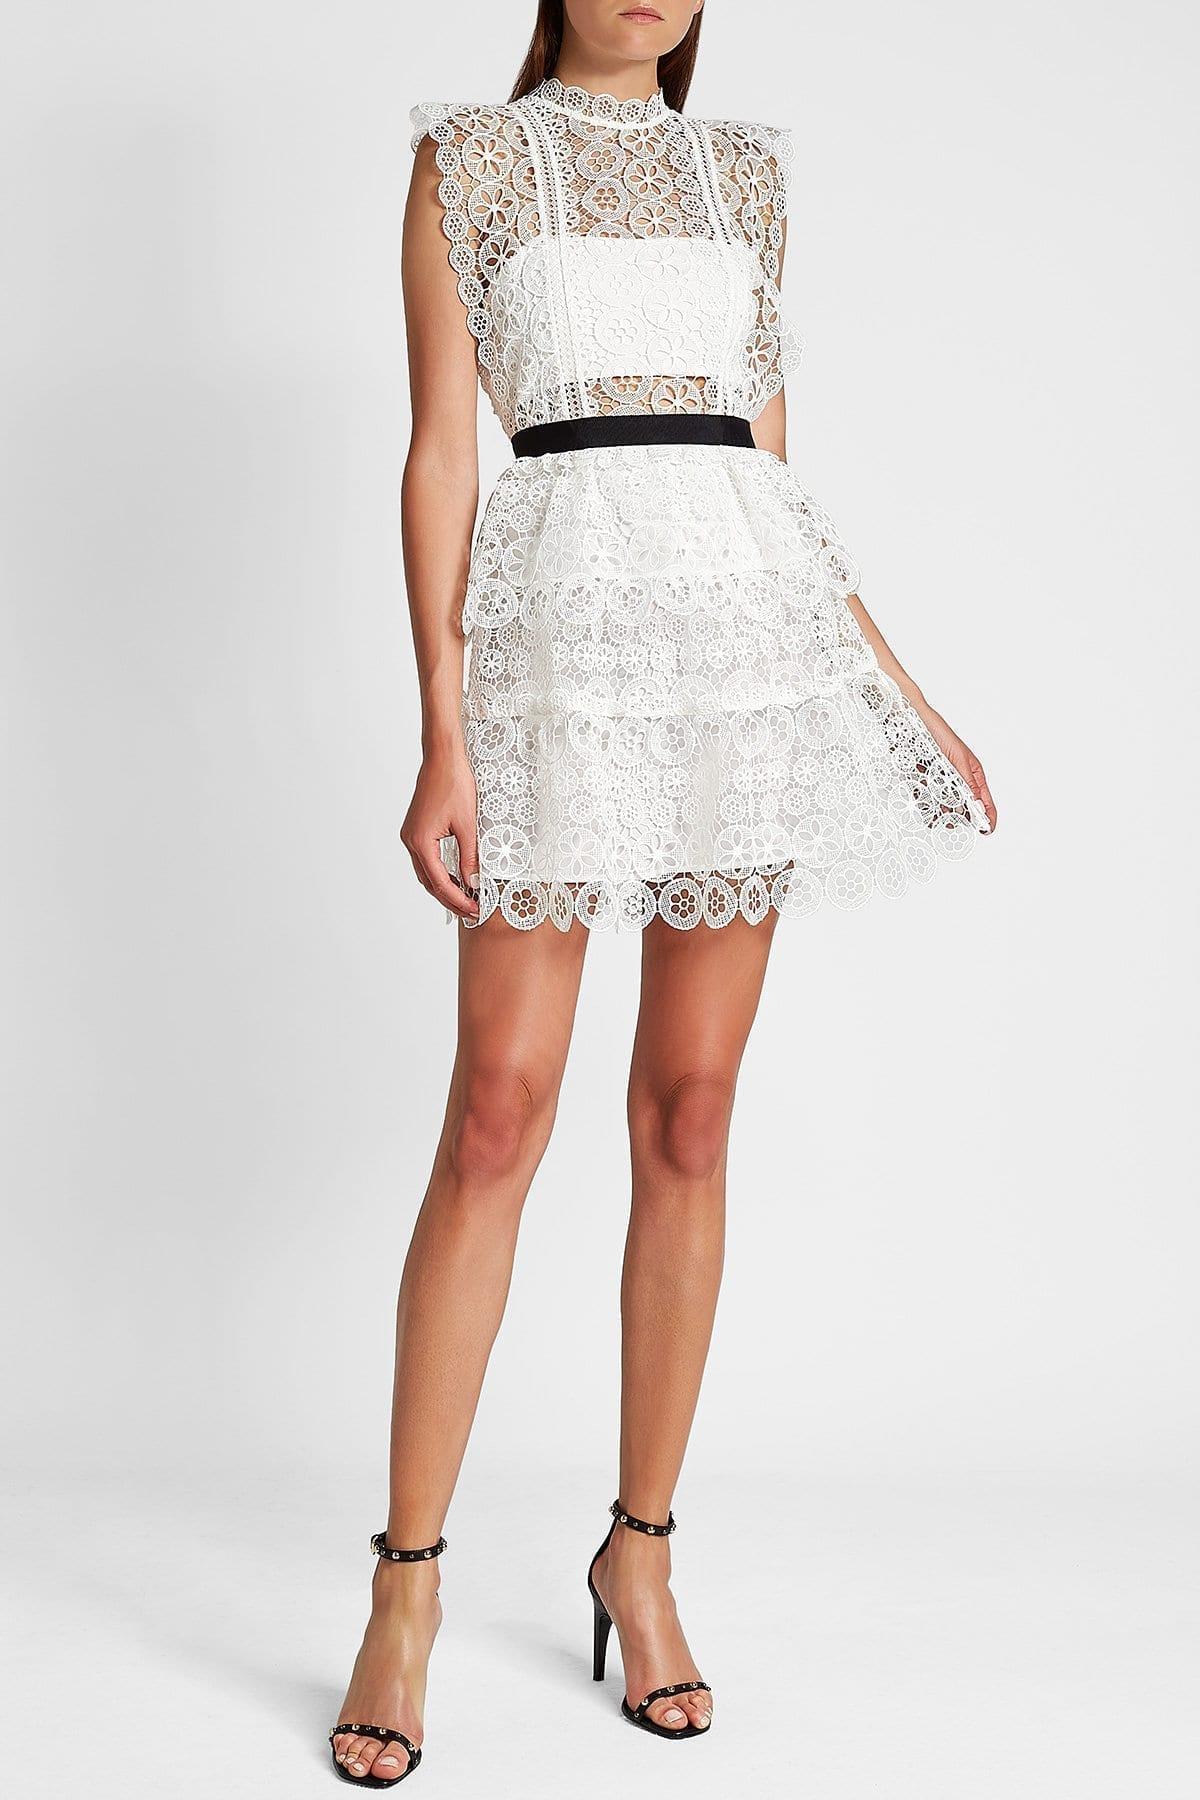 SELF-PORTRAIT Lace Mini White Dress